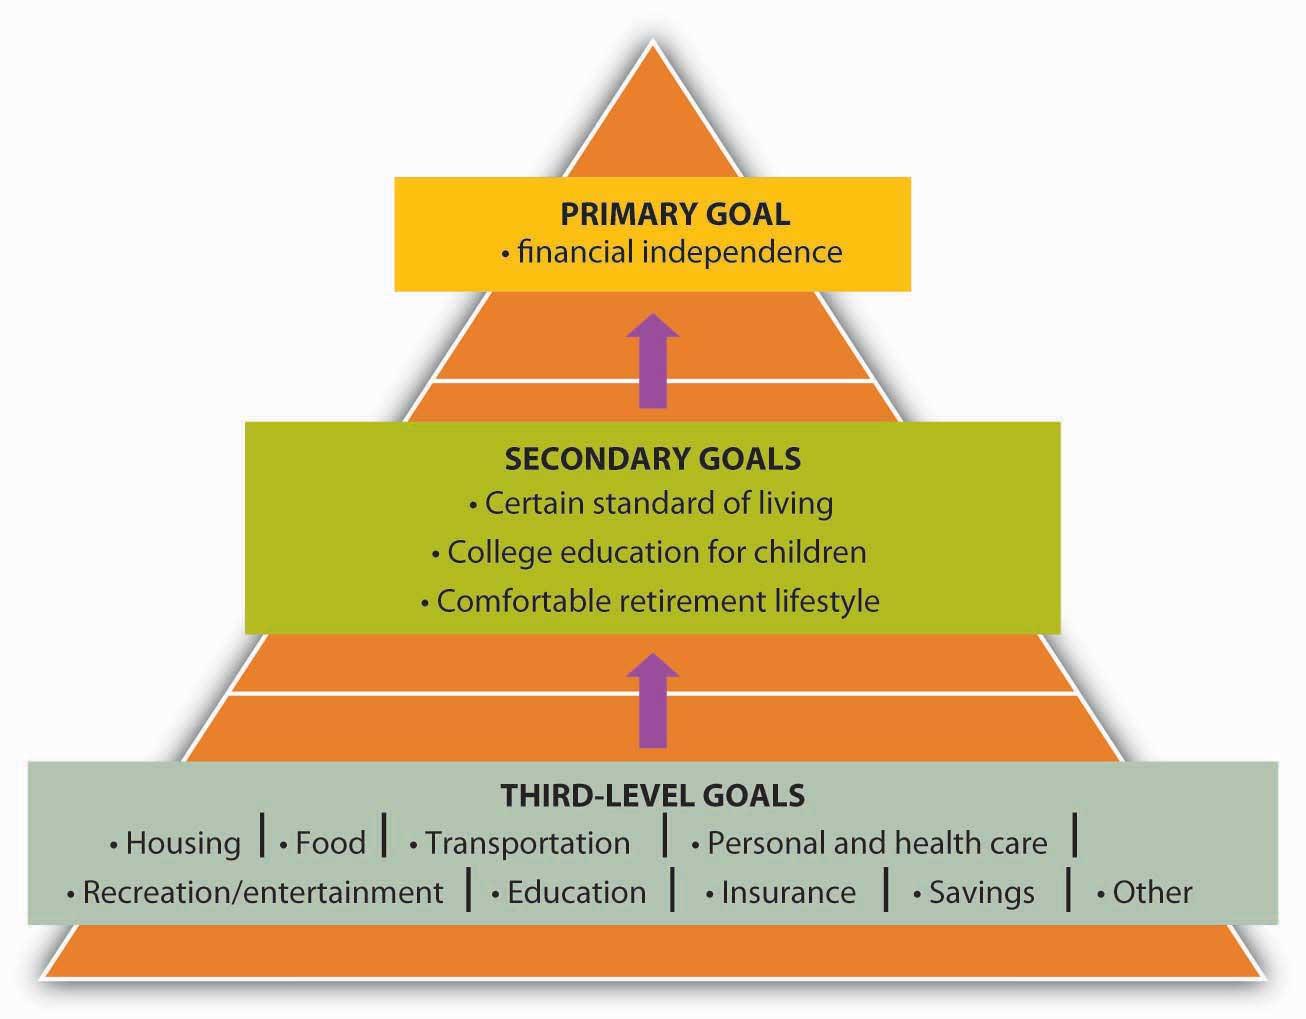 Three-Level Goals/Plans (Primary Goals, Secondary Goals, Third-Level Goals).